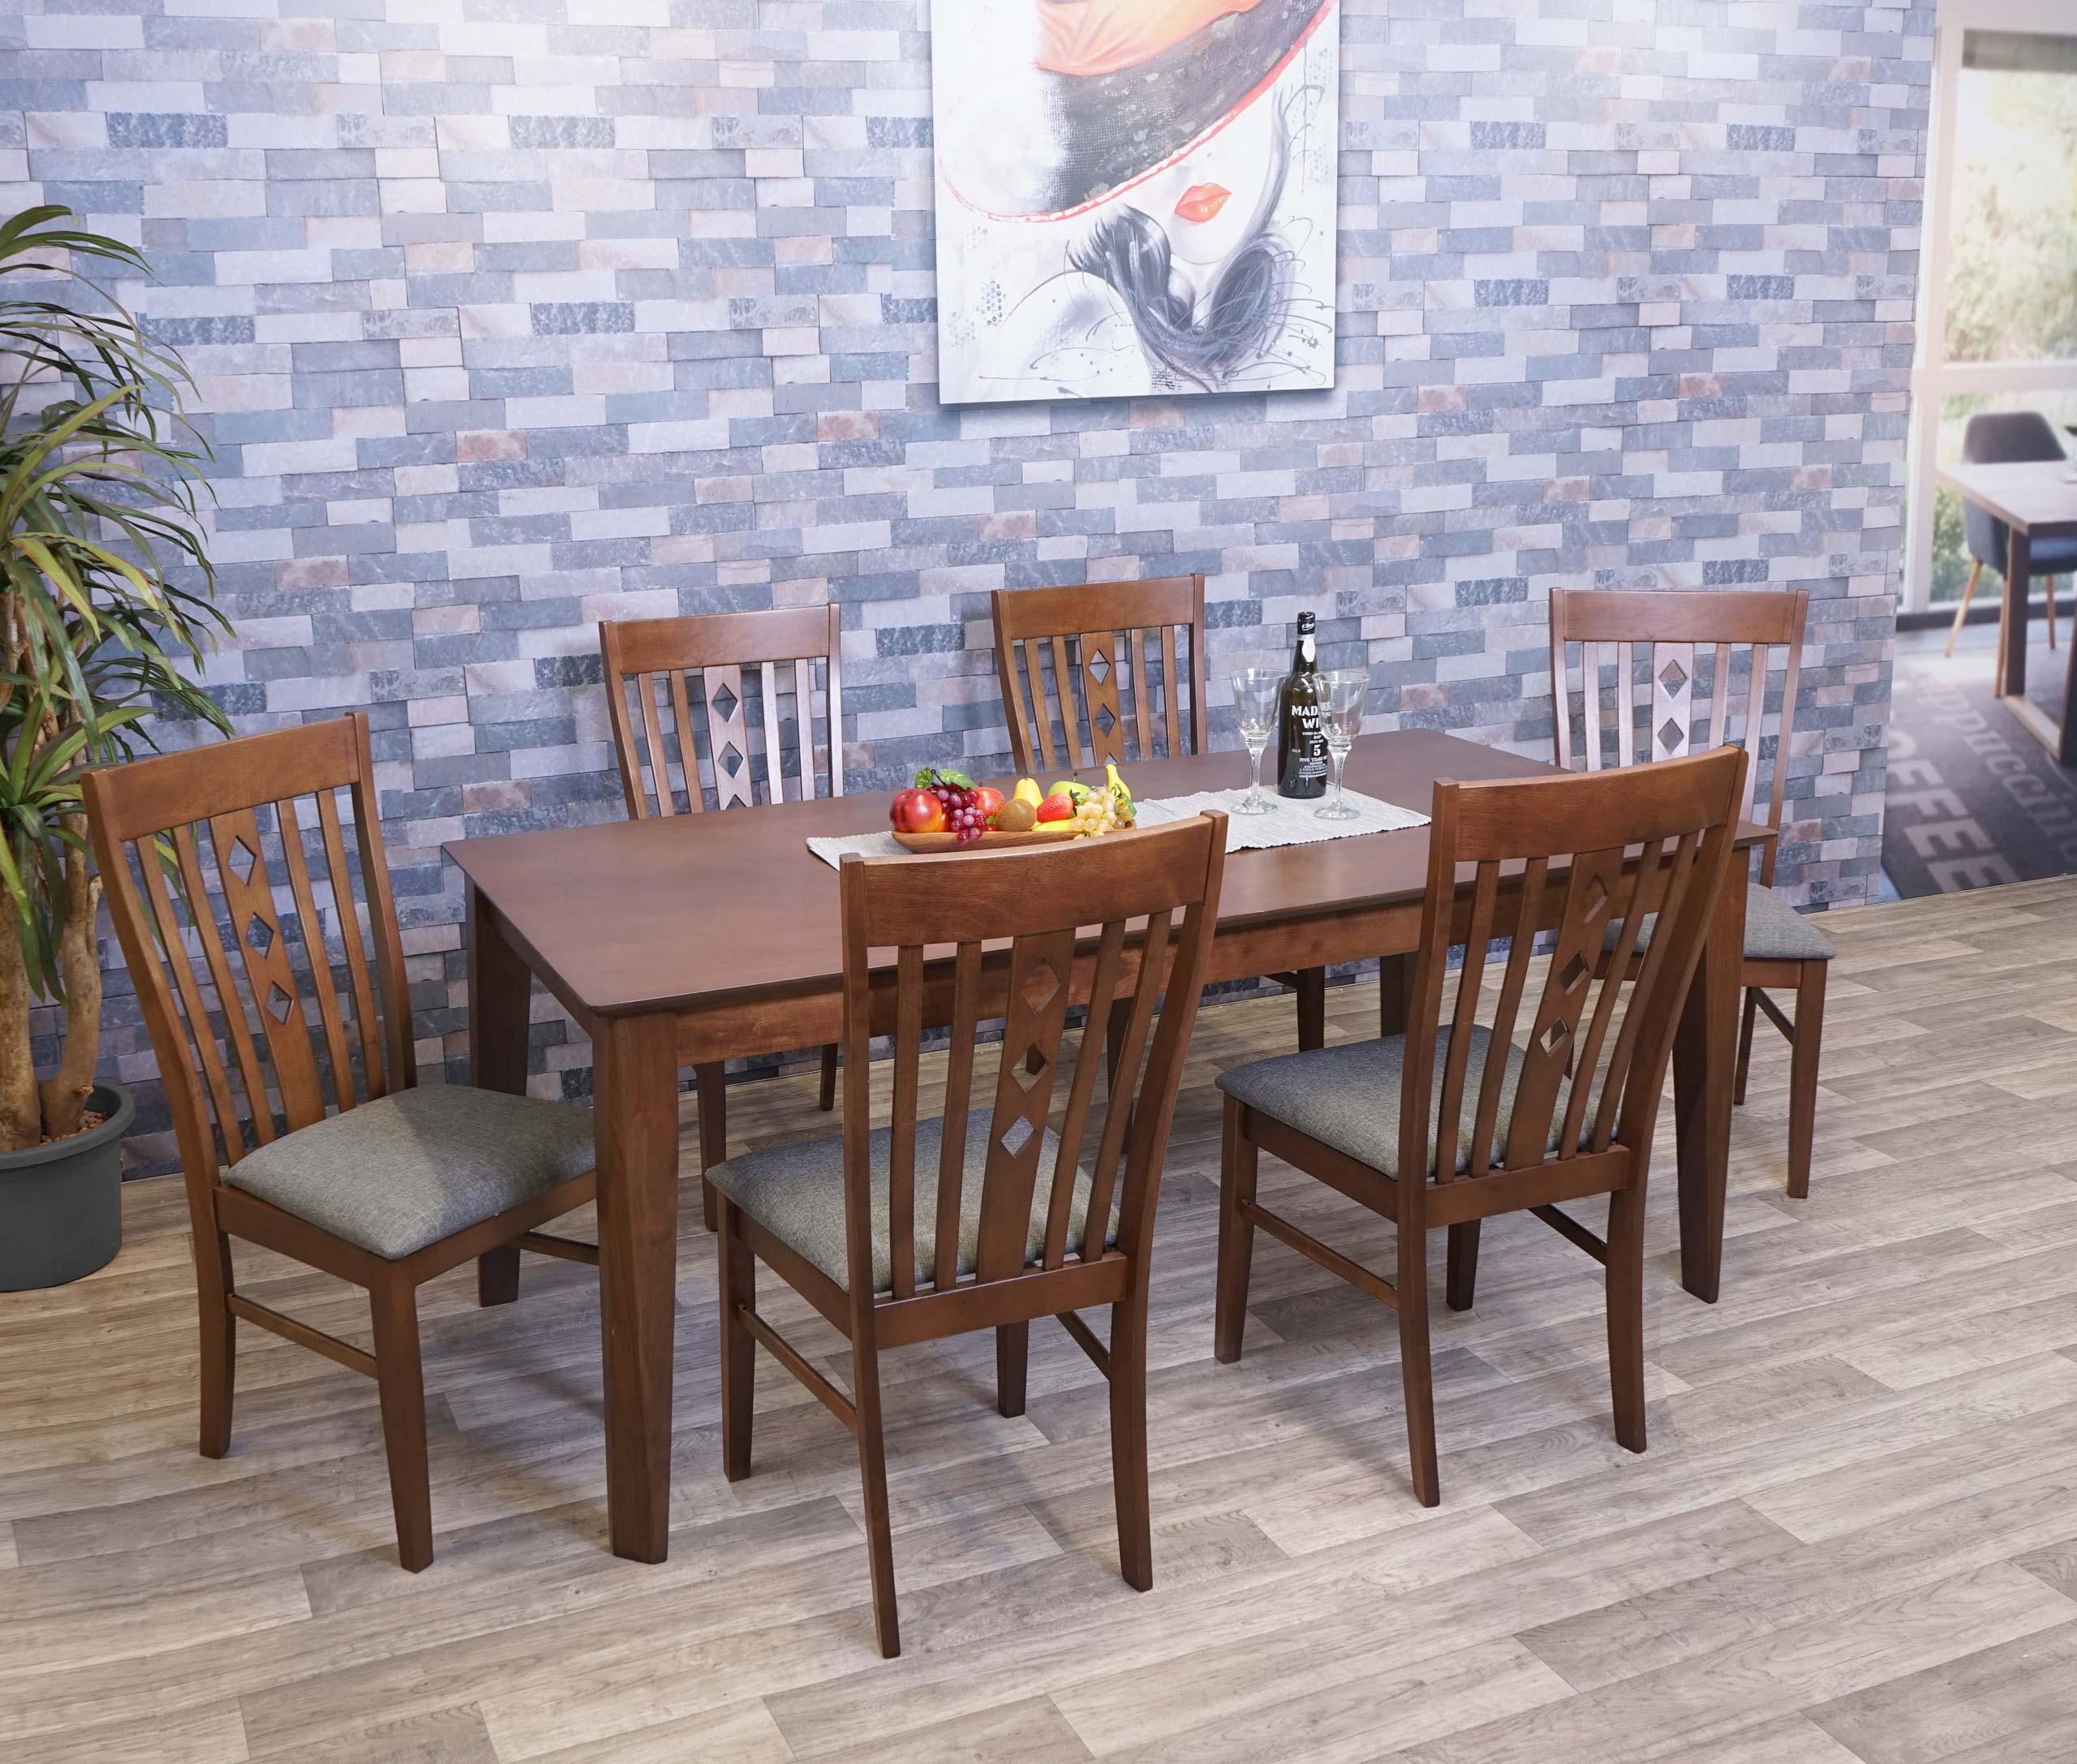 Mendler Esszimmer-Set HWC-G62, Sitzgruppe Esszimmergruppe Esszimmergarnitur, Stoff/Textil Massiv-Holz ~ Vari 3x71811+71815